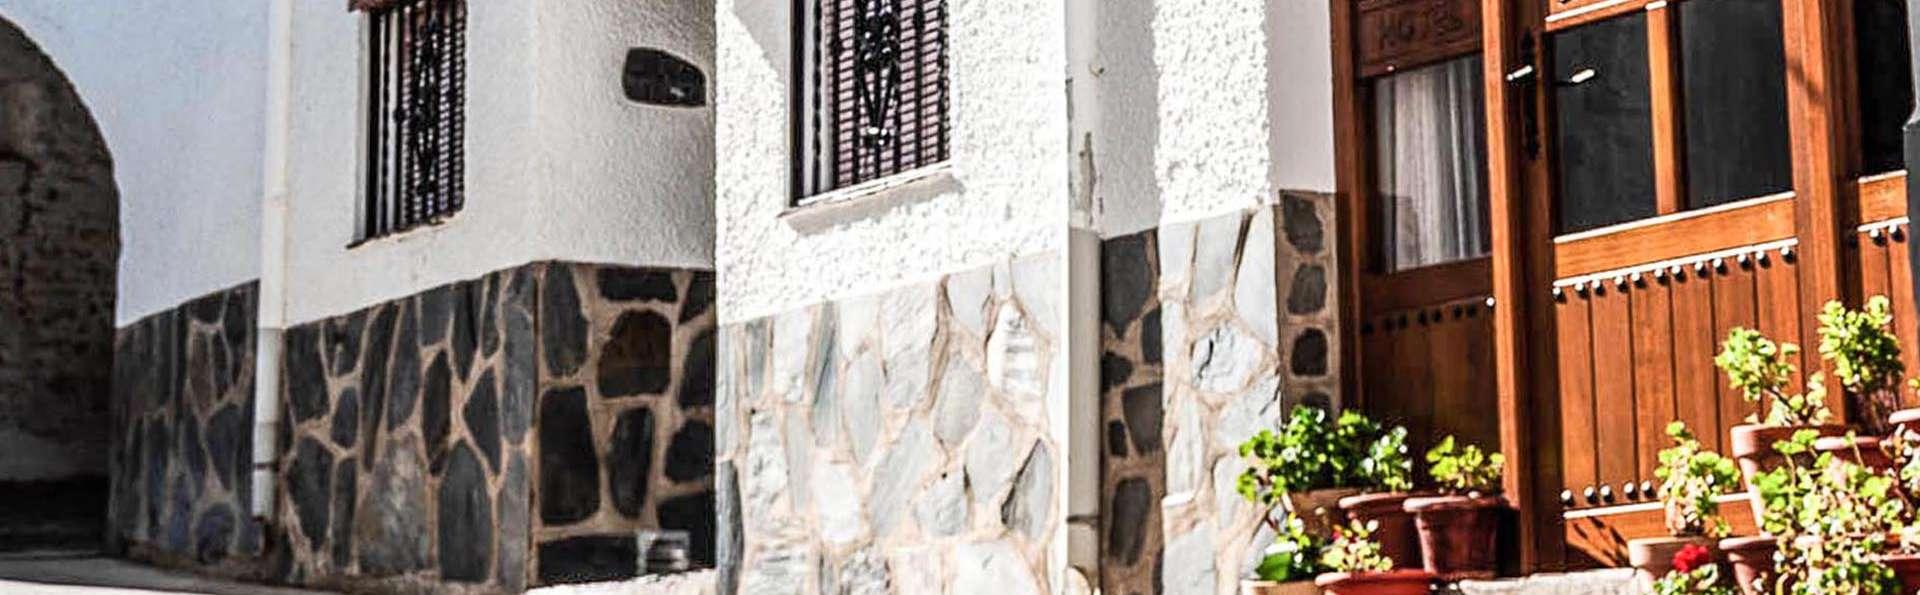 Hotel La Fragua I - EDIT_Fachada_Hotel_la_Fragua_I_01.jpg